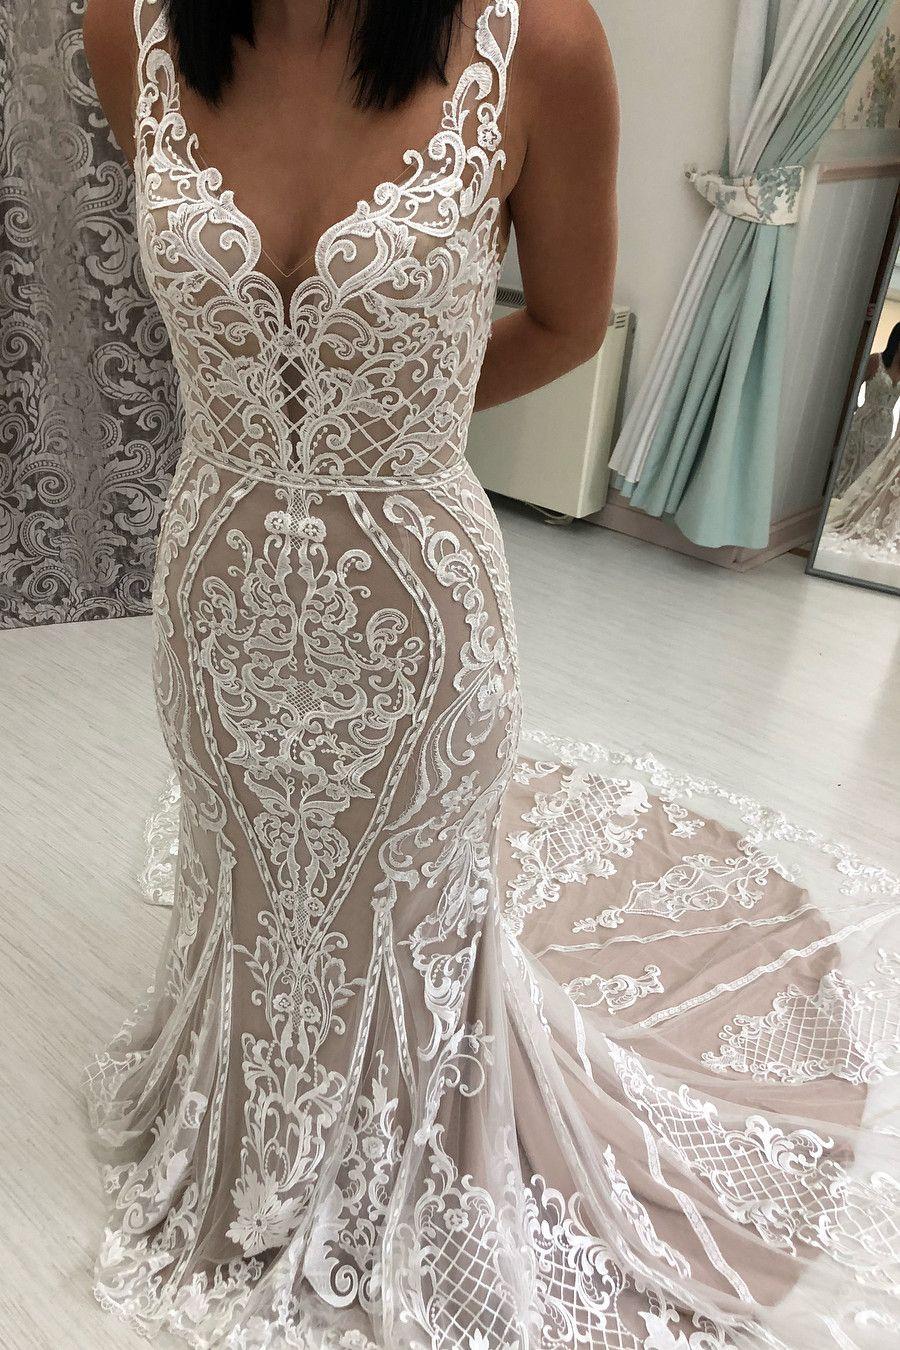 Crepe V Neck Mermaid Wedding Dress With Open V Back And Lace Top Pronovias Emily Pronovias Wedding Dress Fit And Flare Wedding Dress Wedding Dress Necklines [ 2255 x 1900 Pixel ]